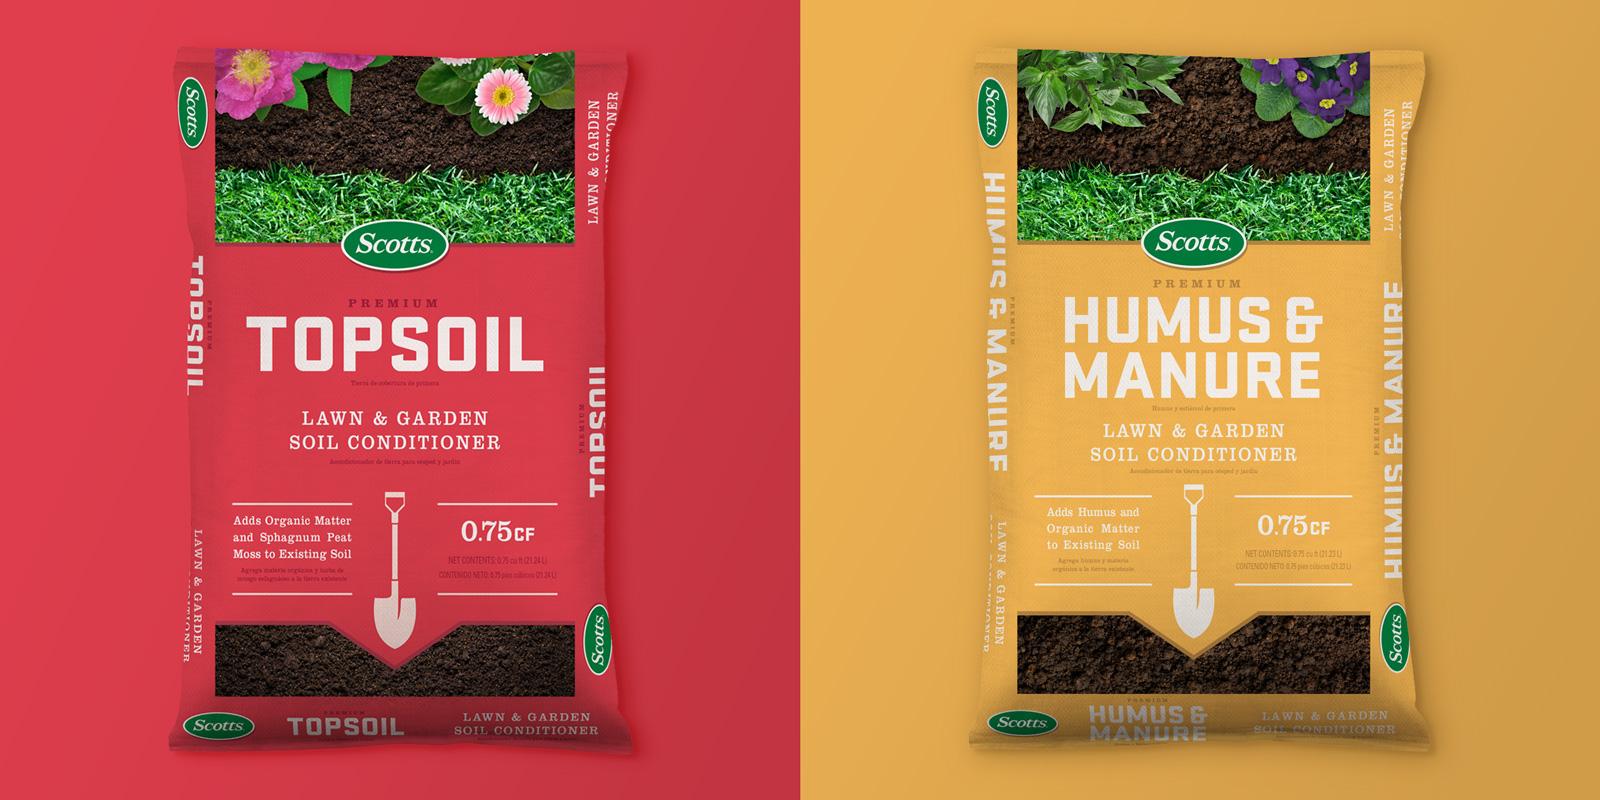 Wink - Scotts Premium Soils 4.jpg